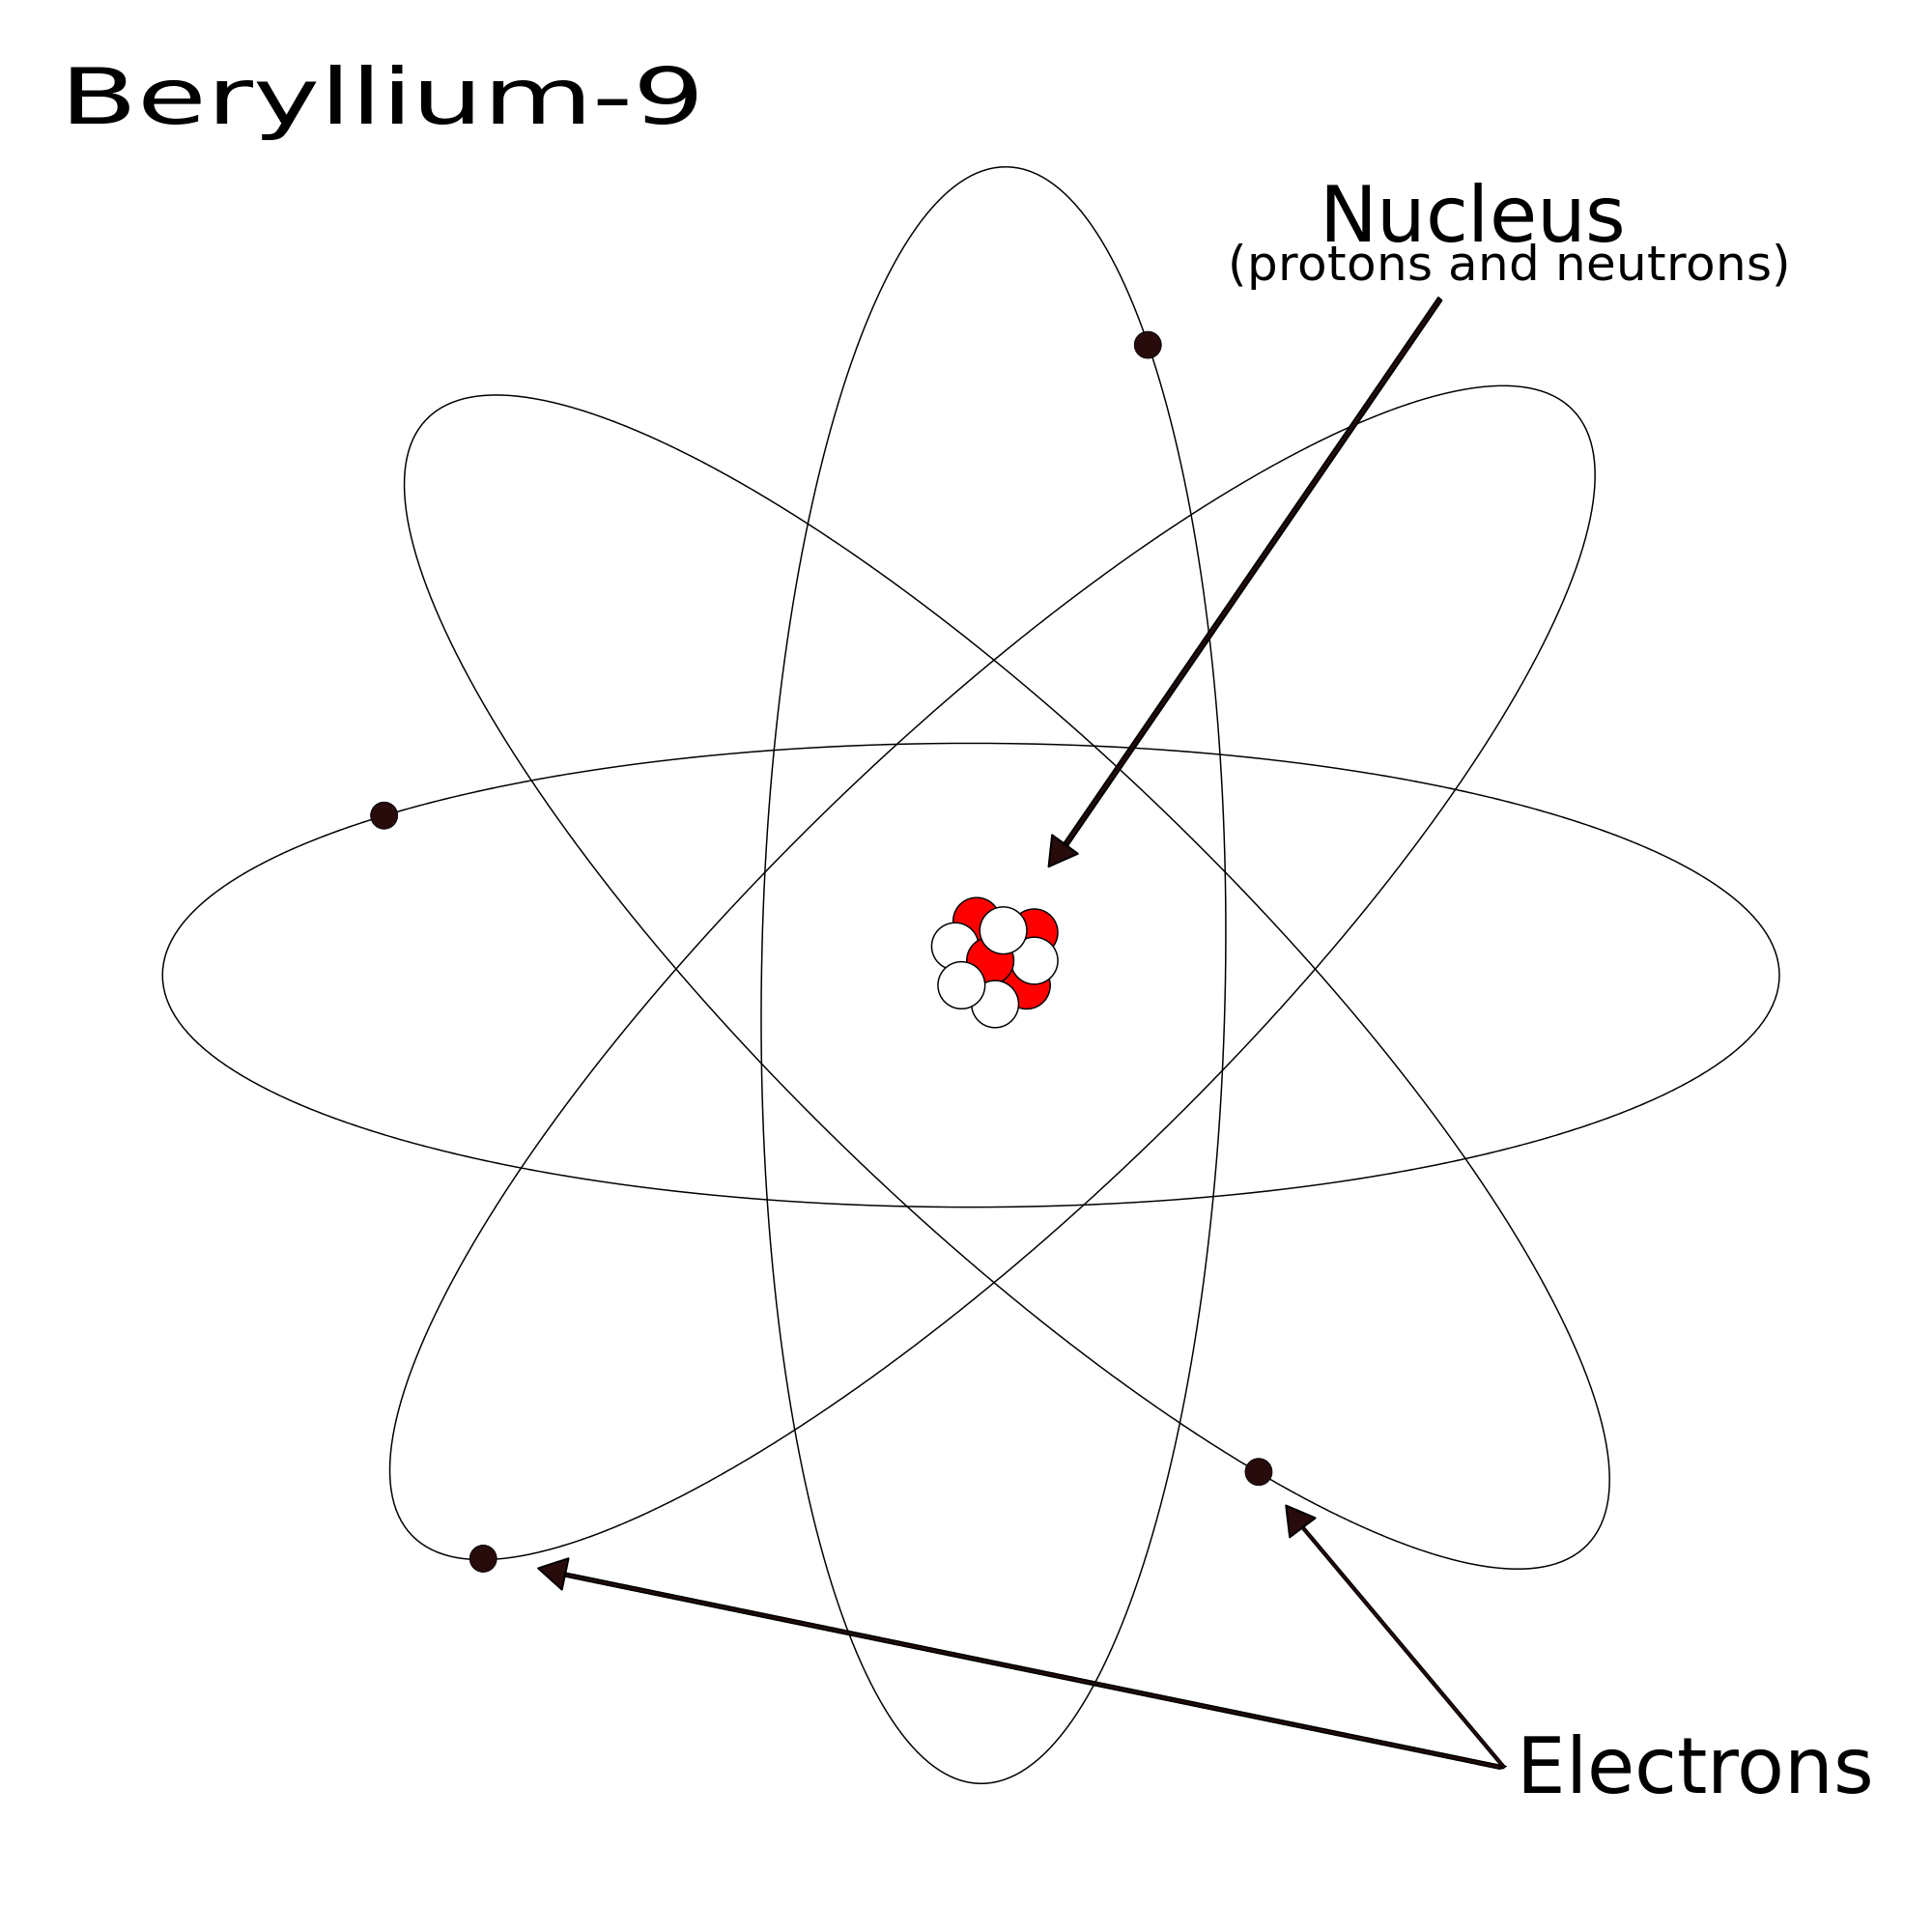 Electron-atoms